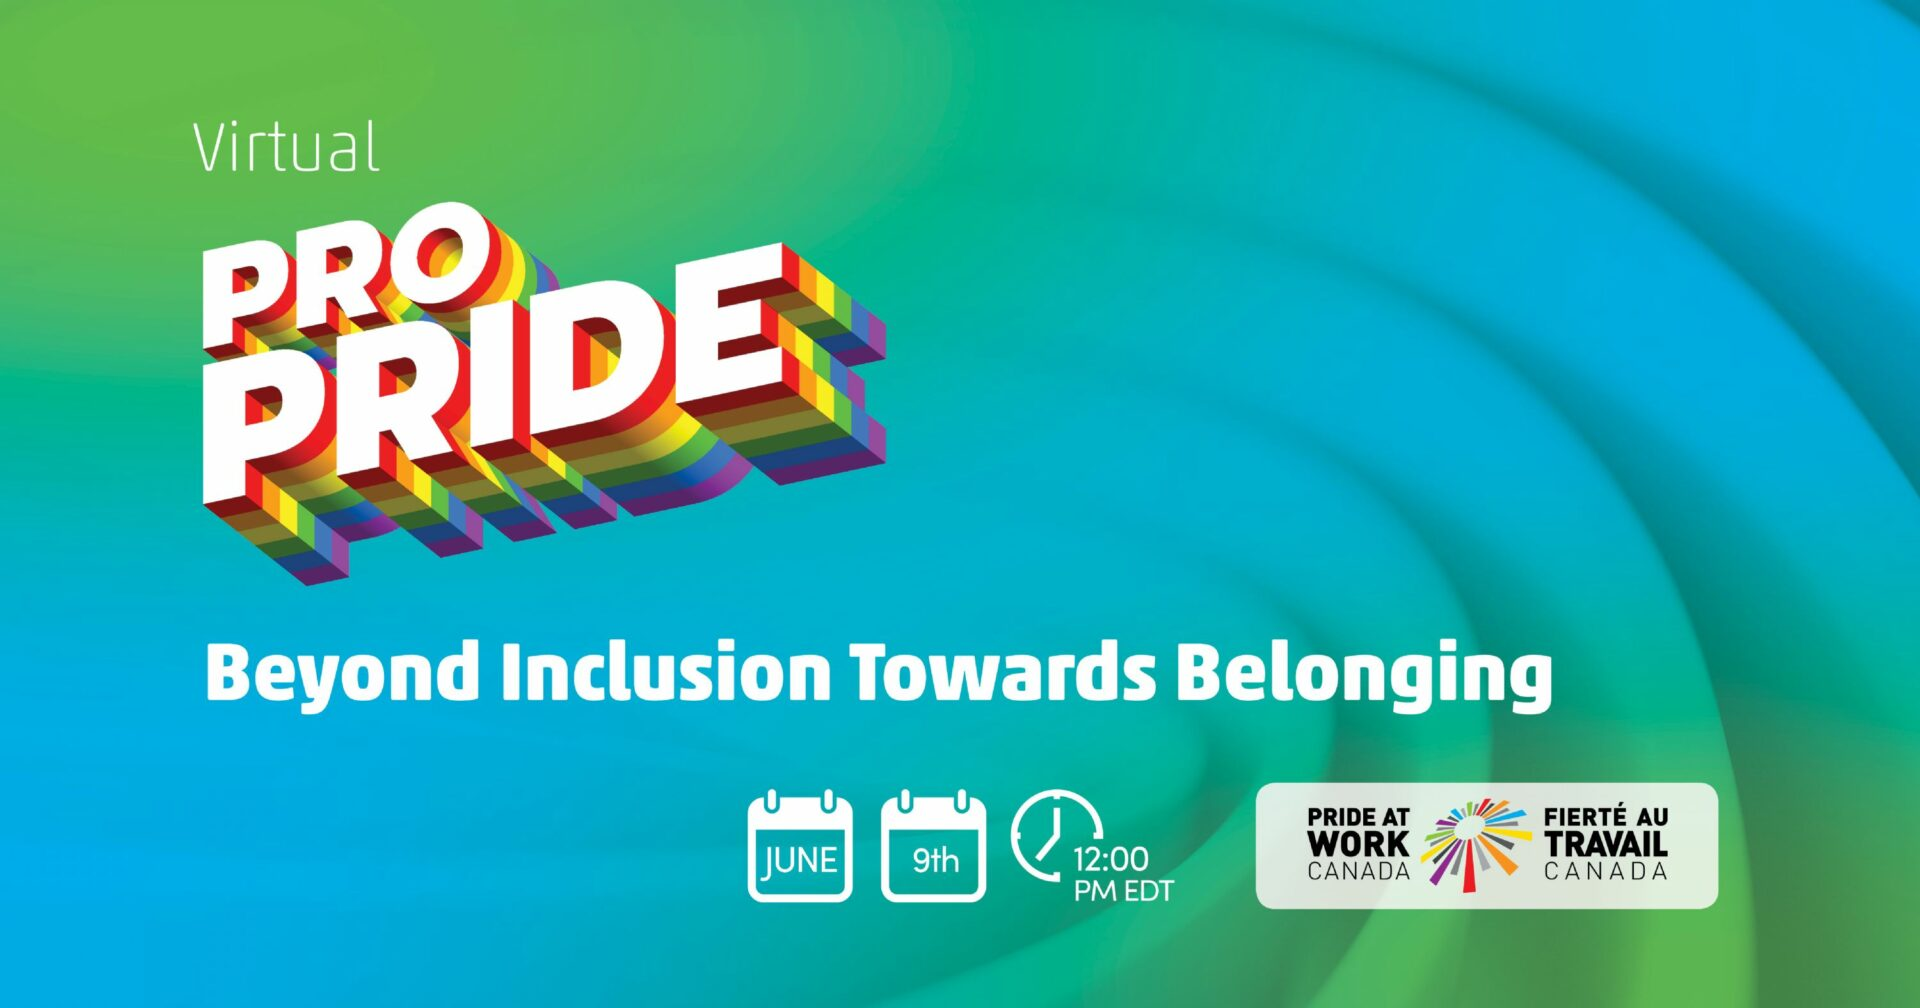 Virtual ProPride: Beyond Inclusion Towards Belonging